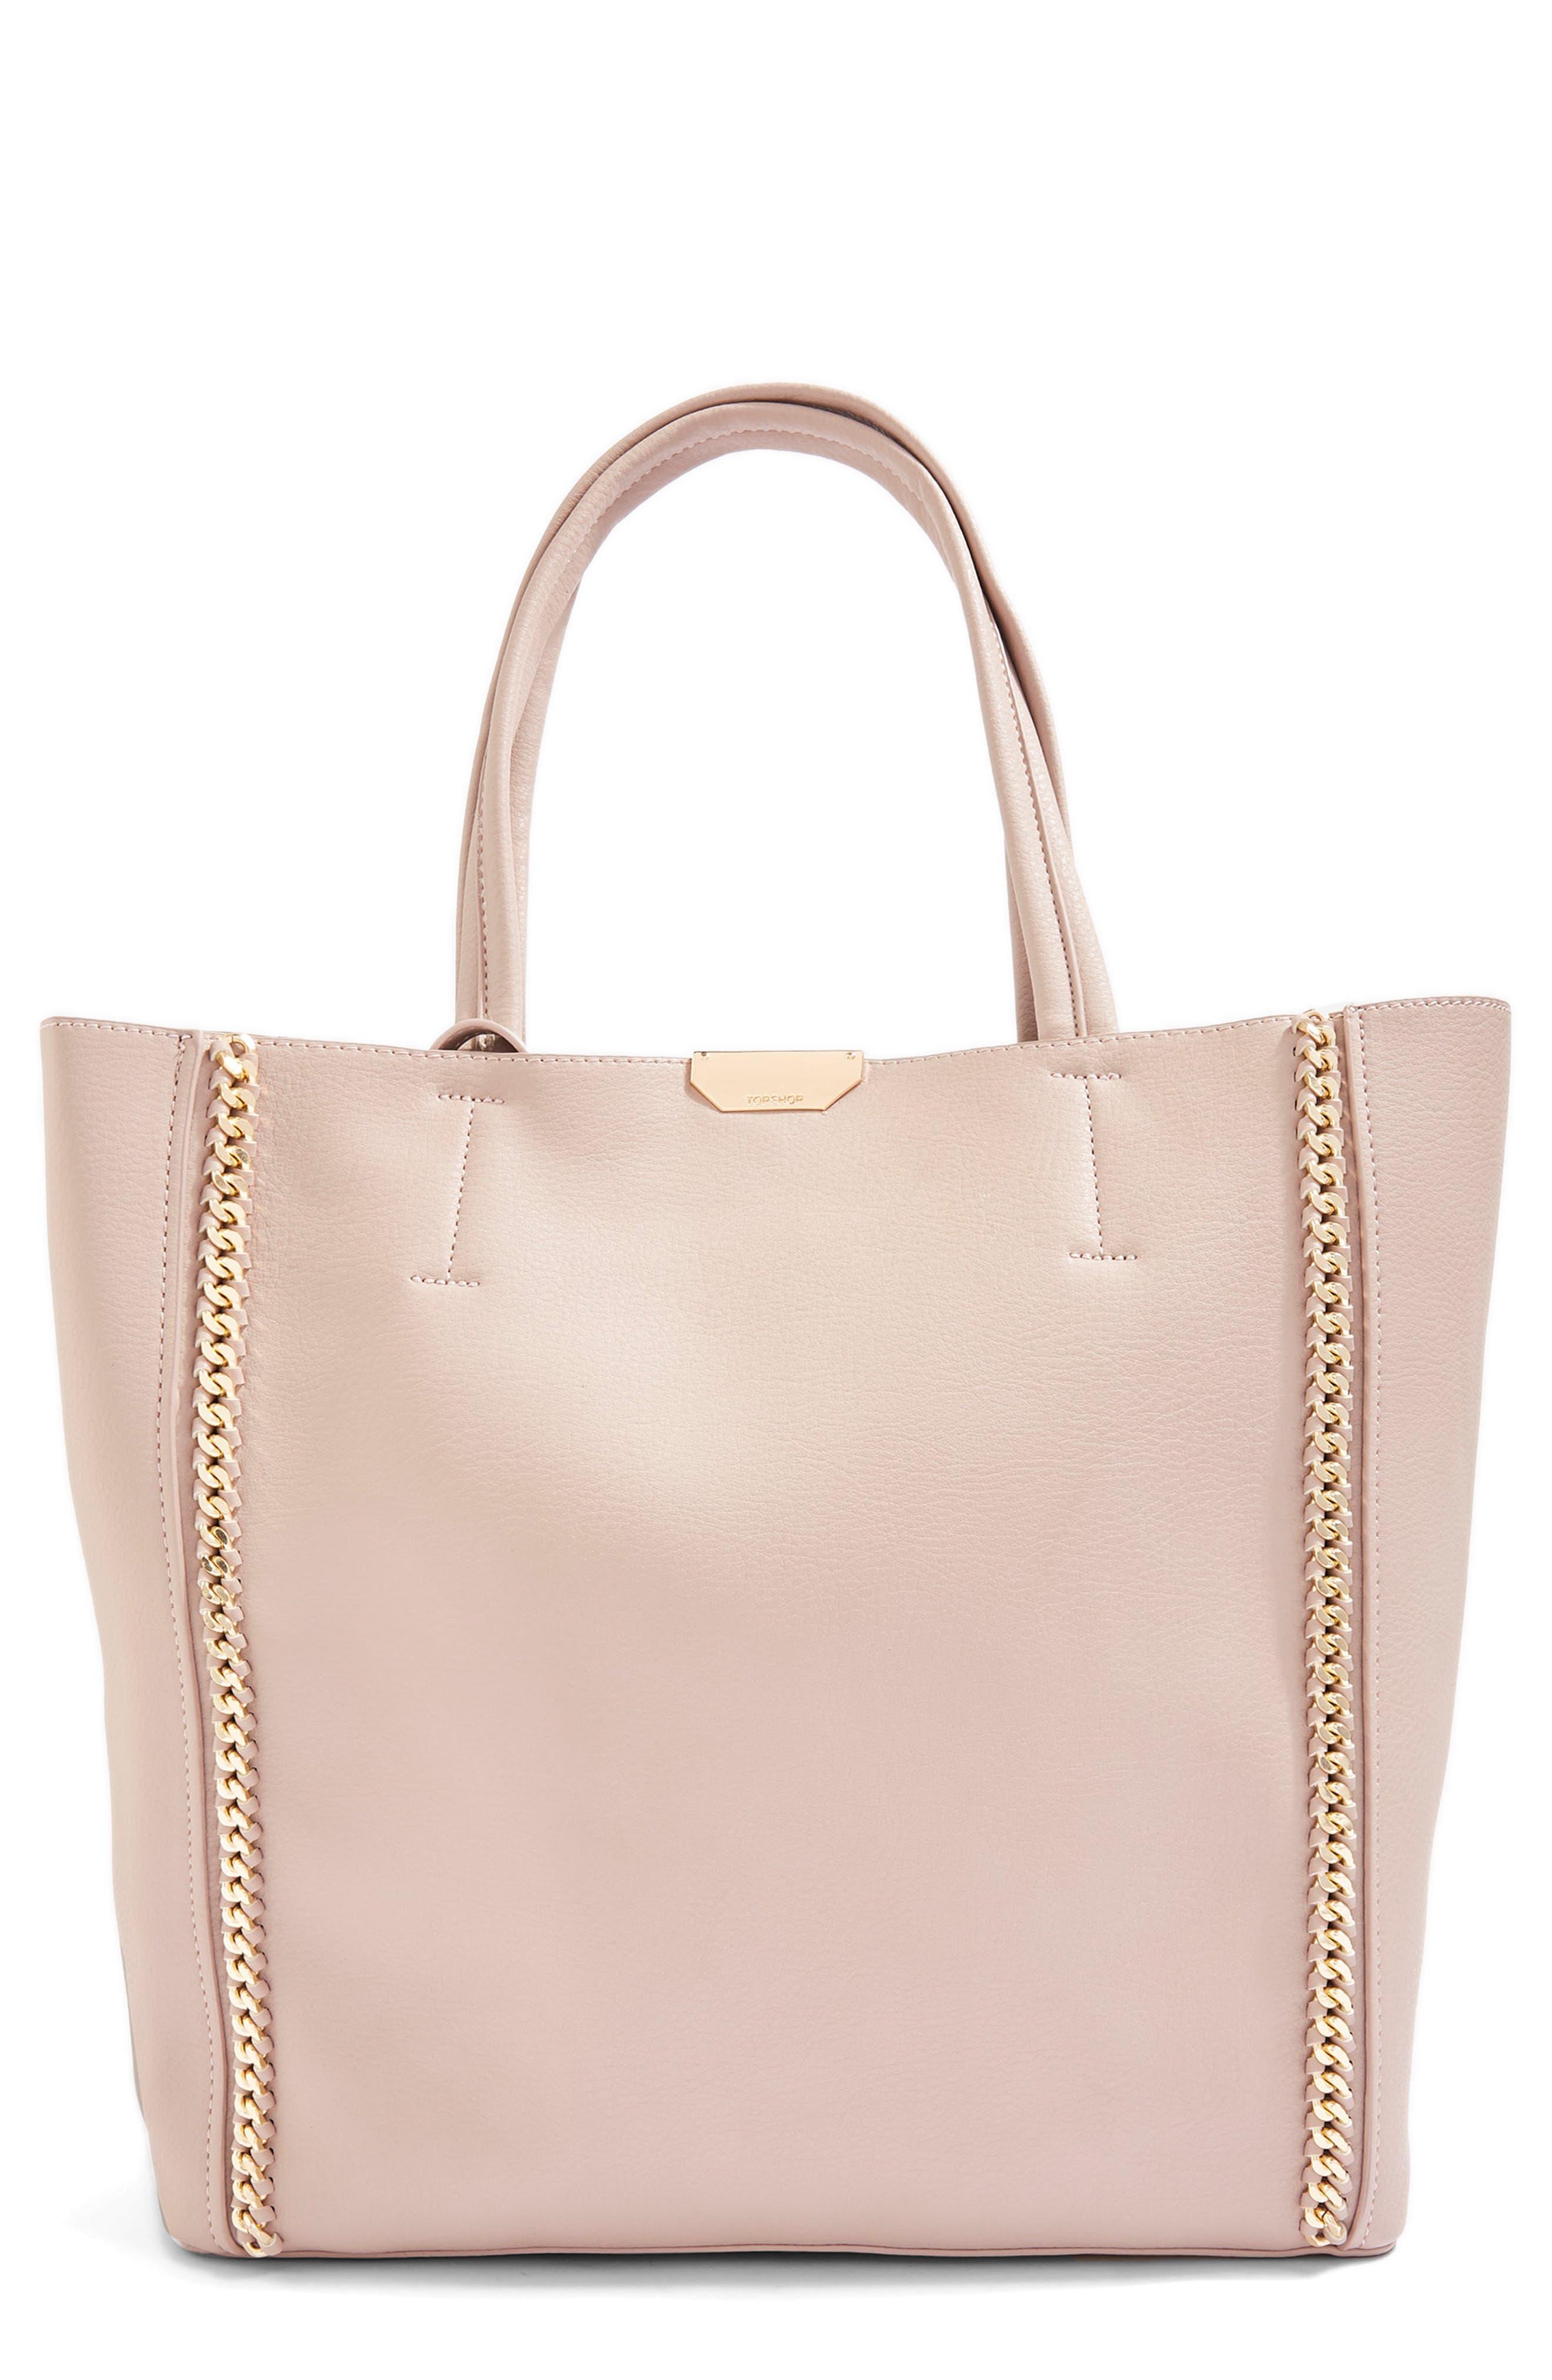 Sade Chain Shopper Bag,                             Main thumbnail 1, color,                             Nude Multi